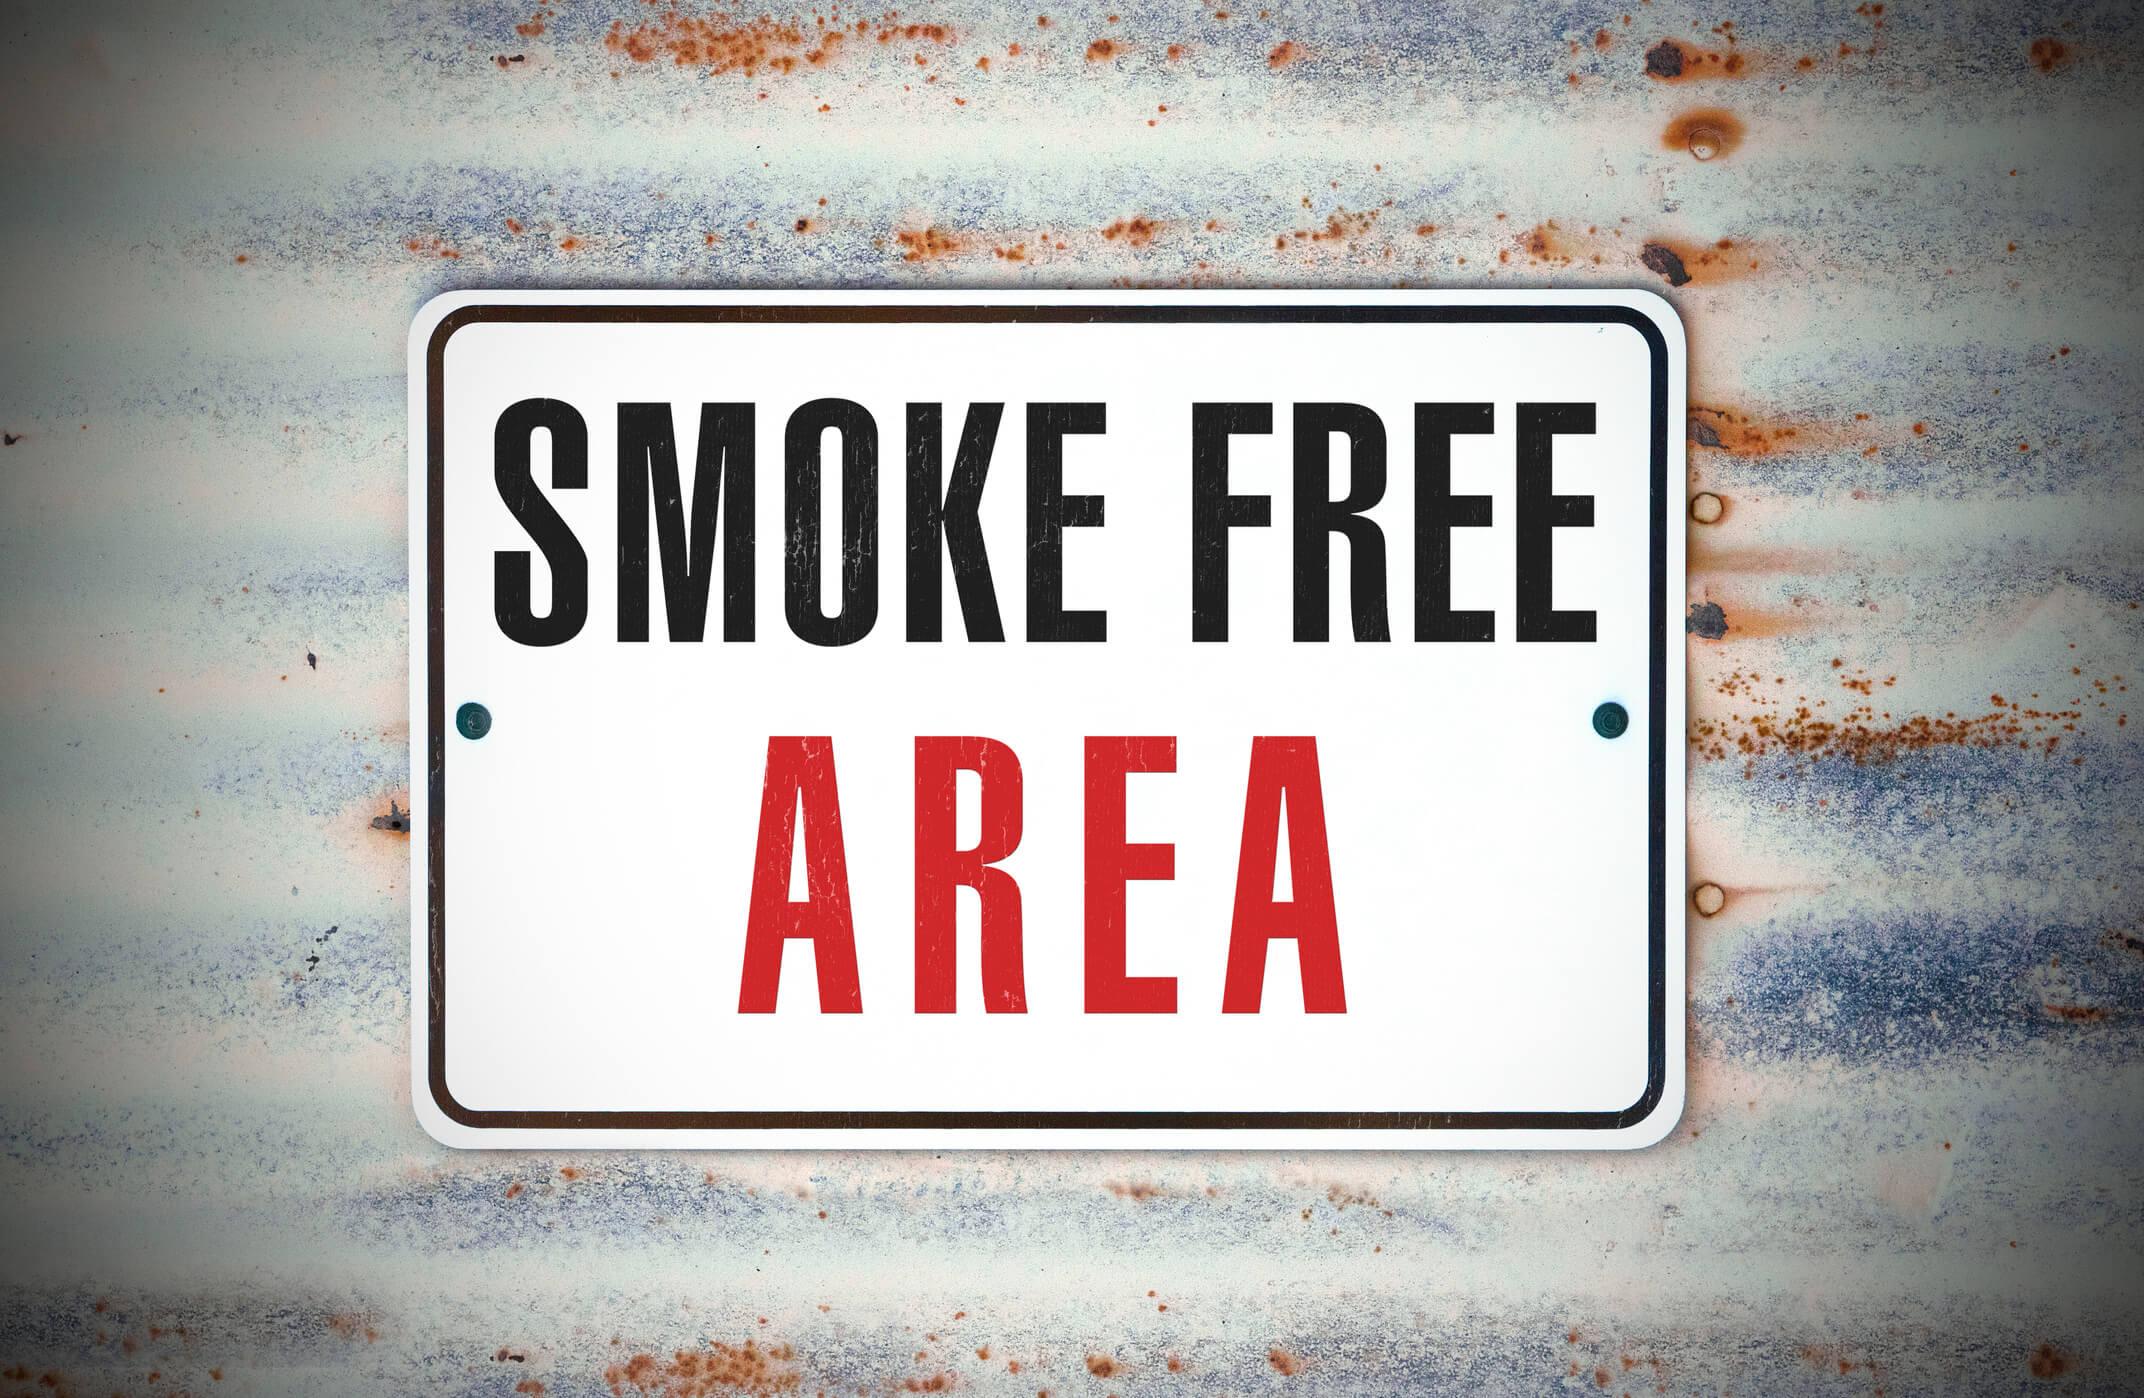 Smoke free area poster